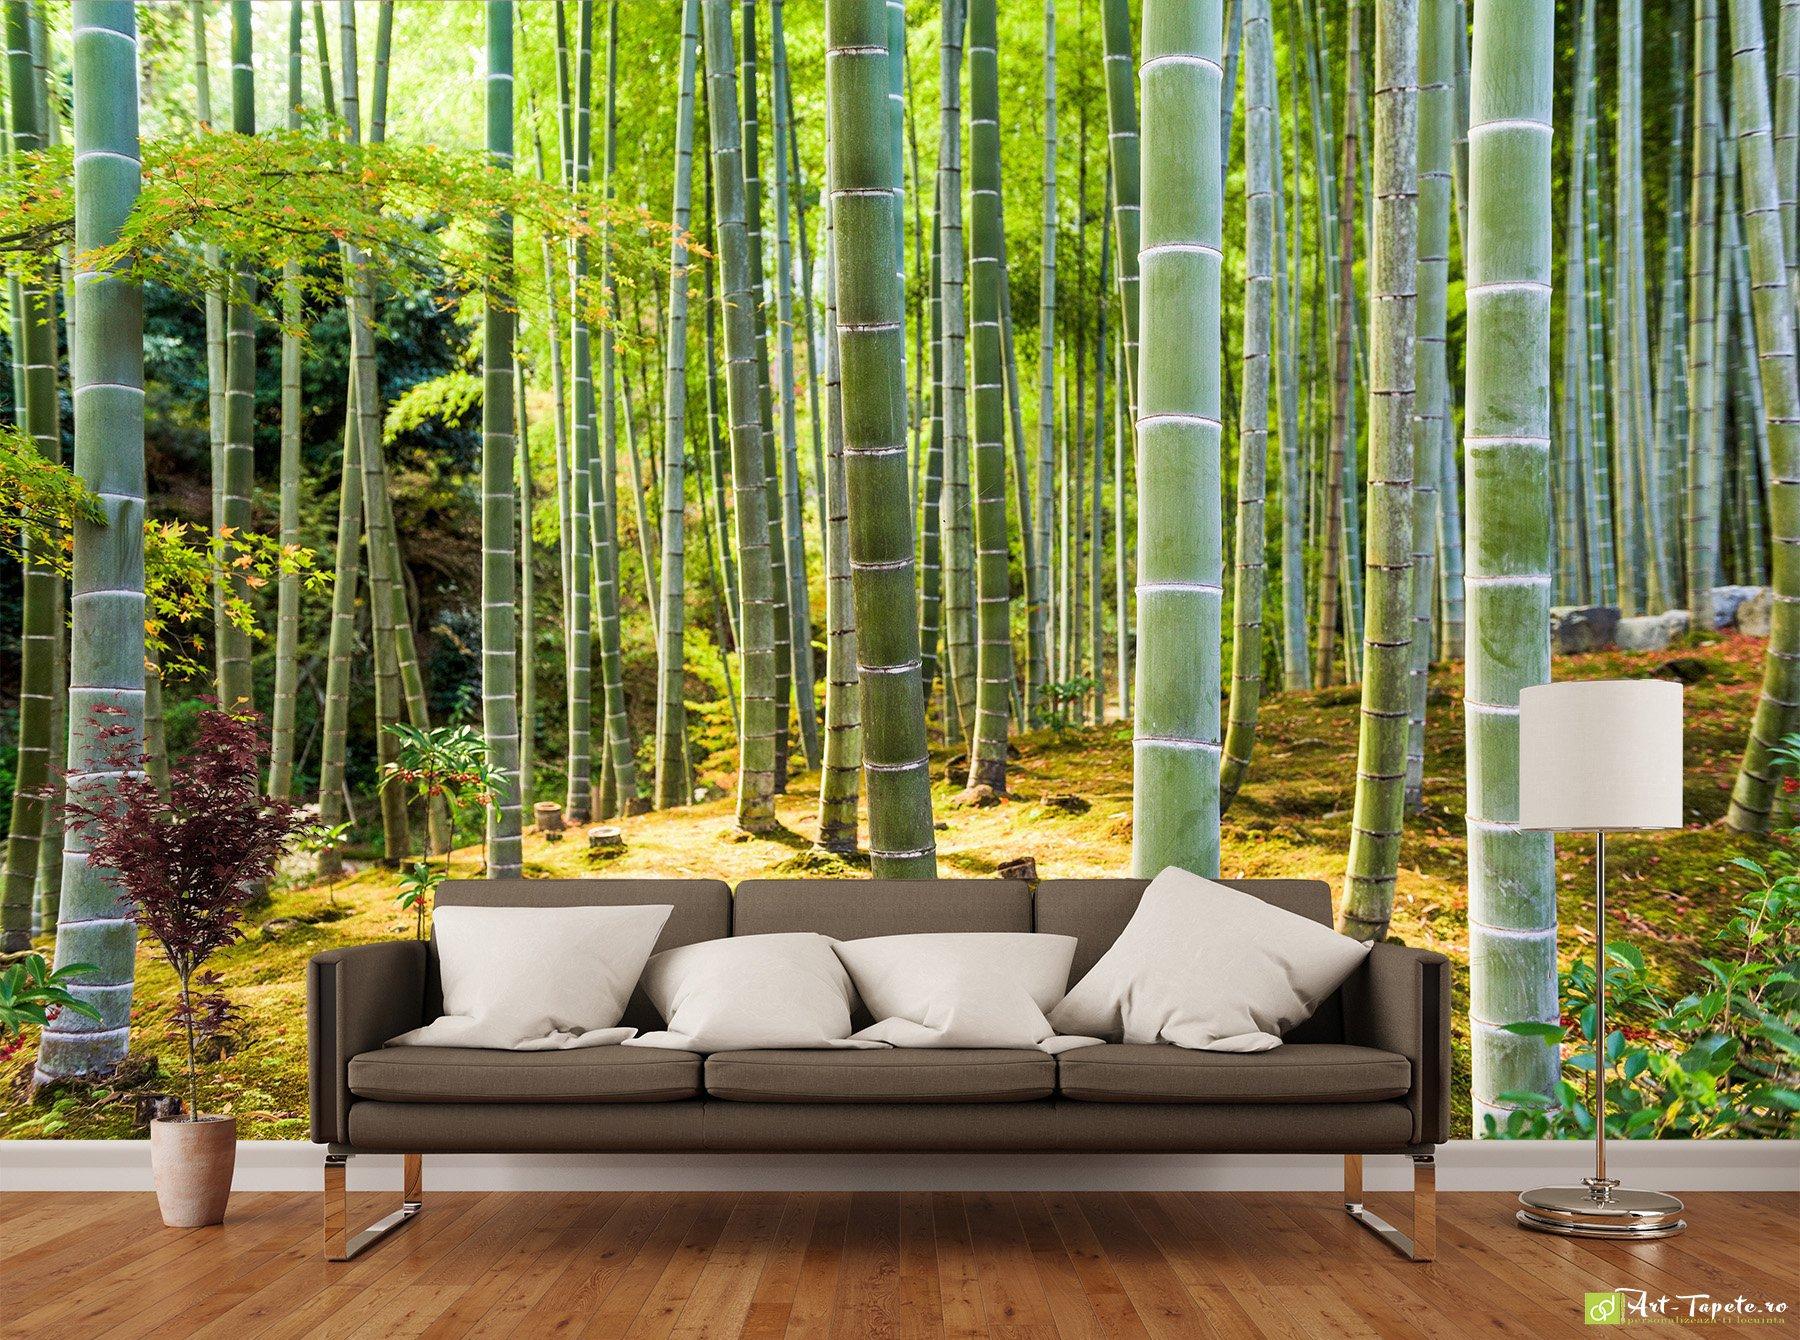 Фотообои лес интернет магазин